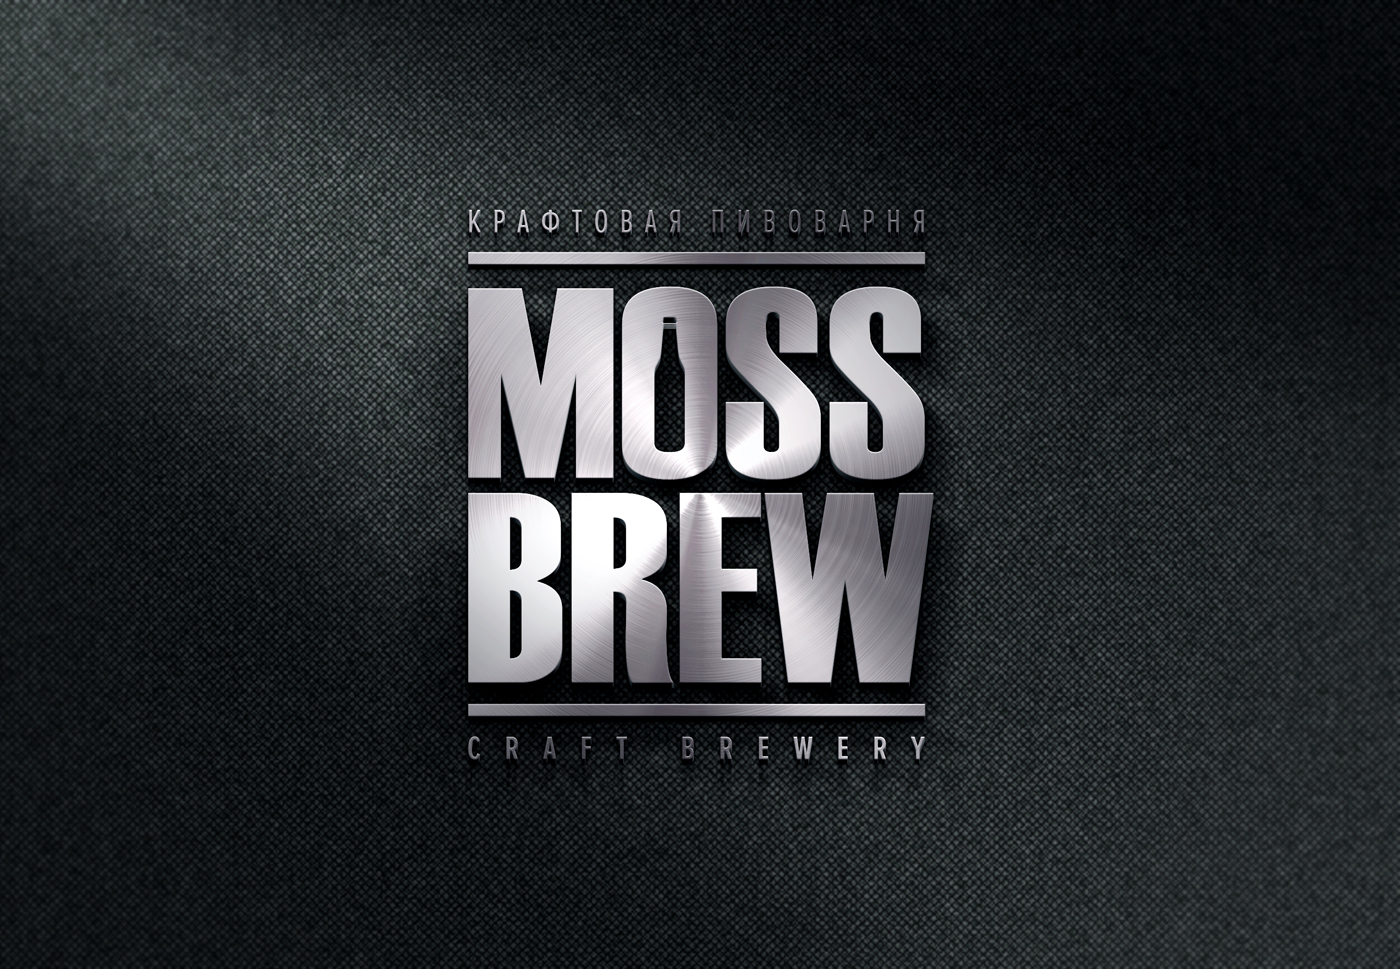 Логотип для пивоварни фото f_978598b40a13a82d.jpg